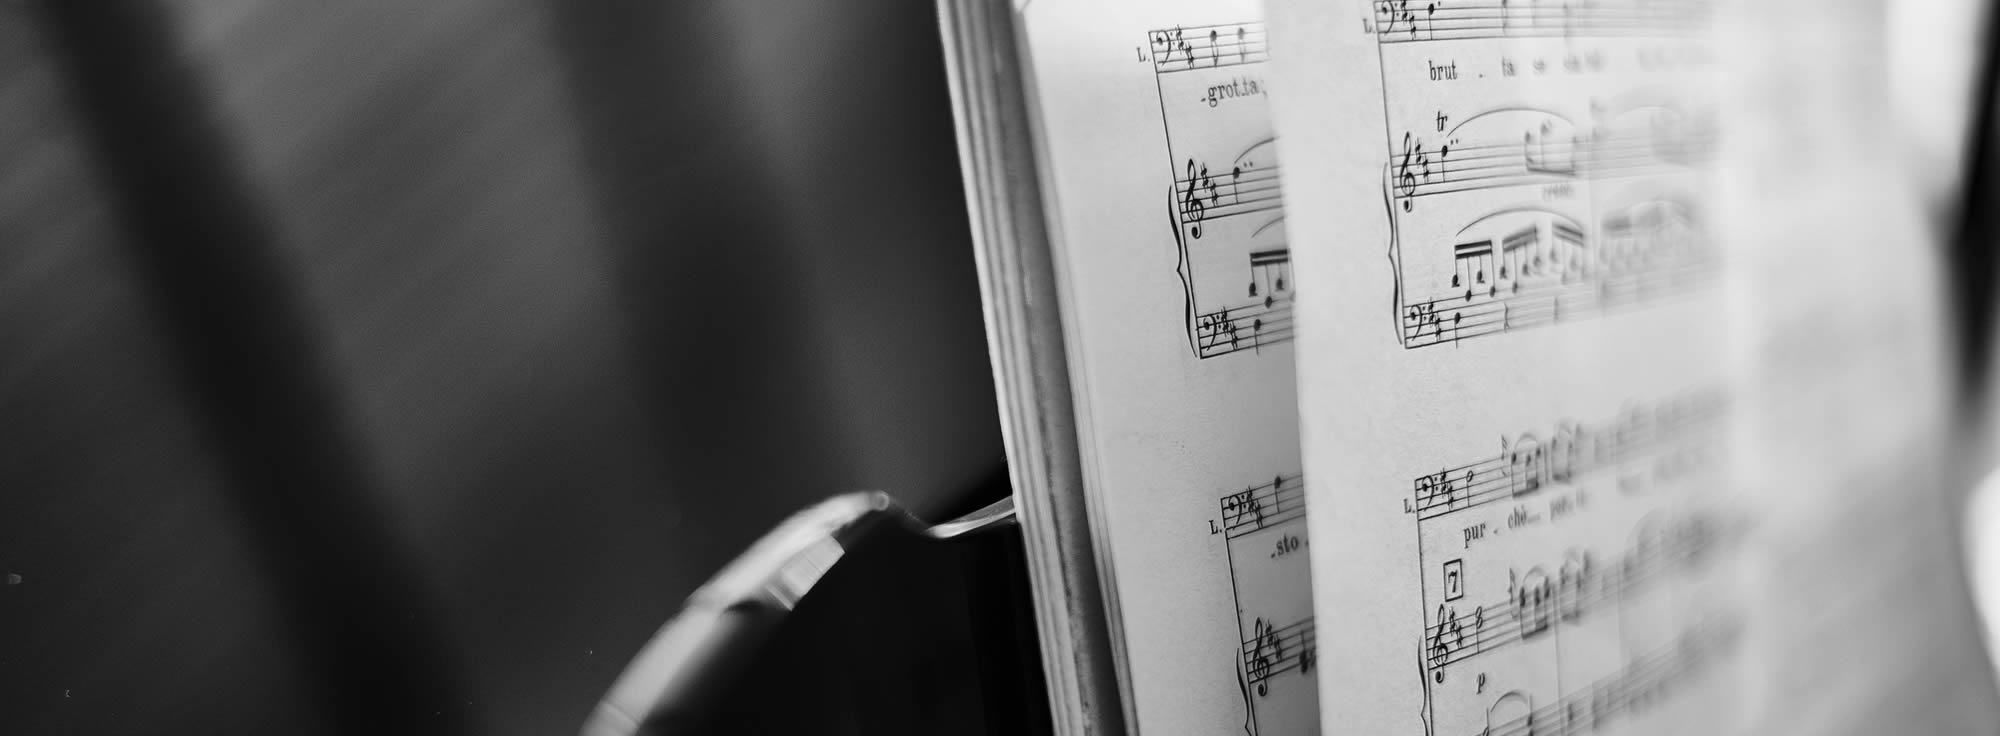 Copyright in Music and Lyrics